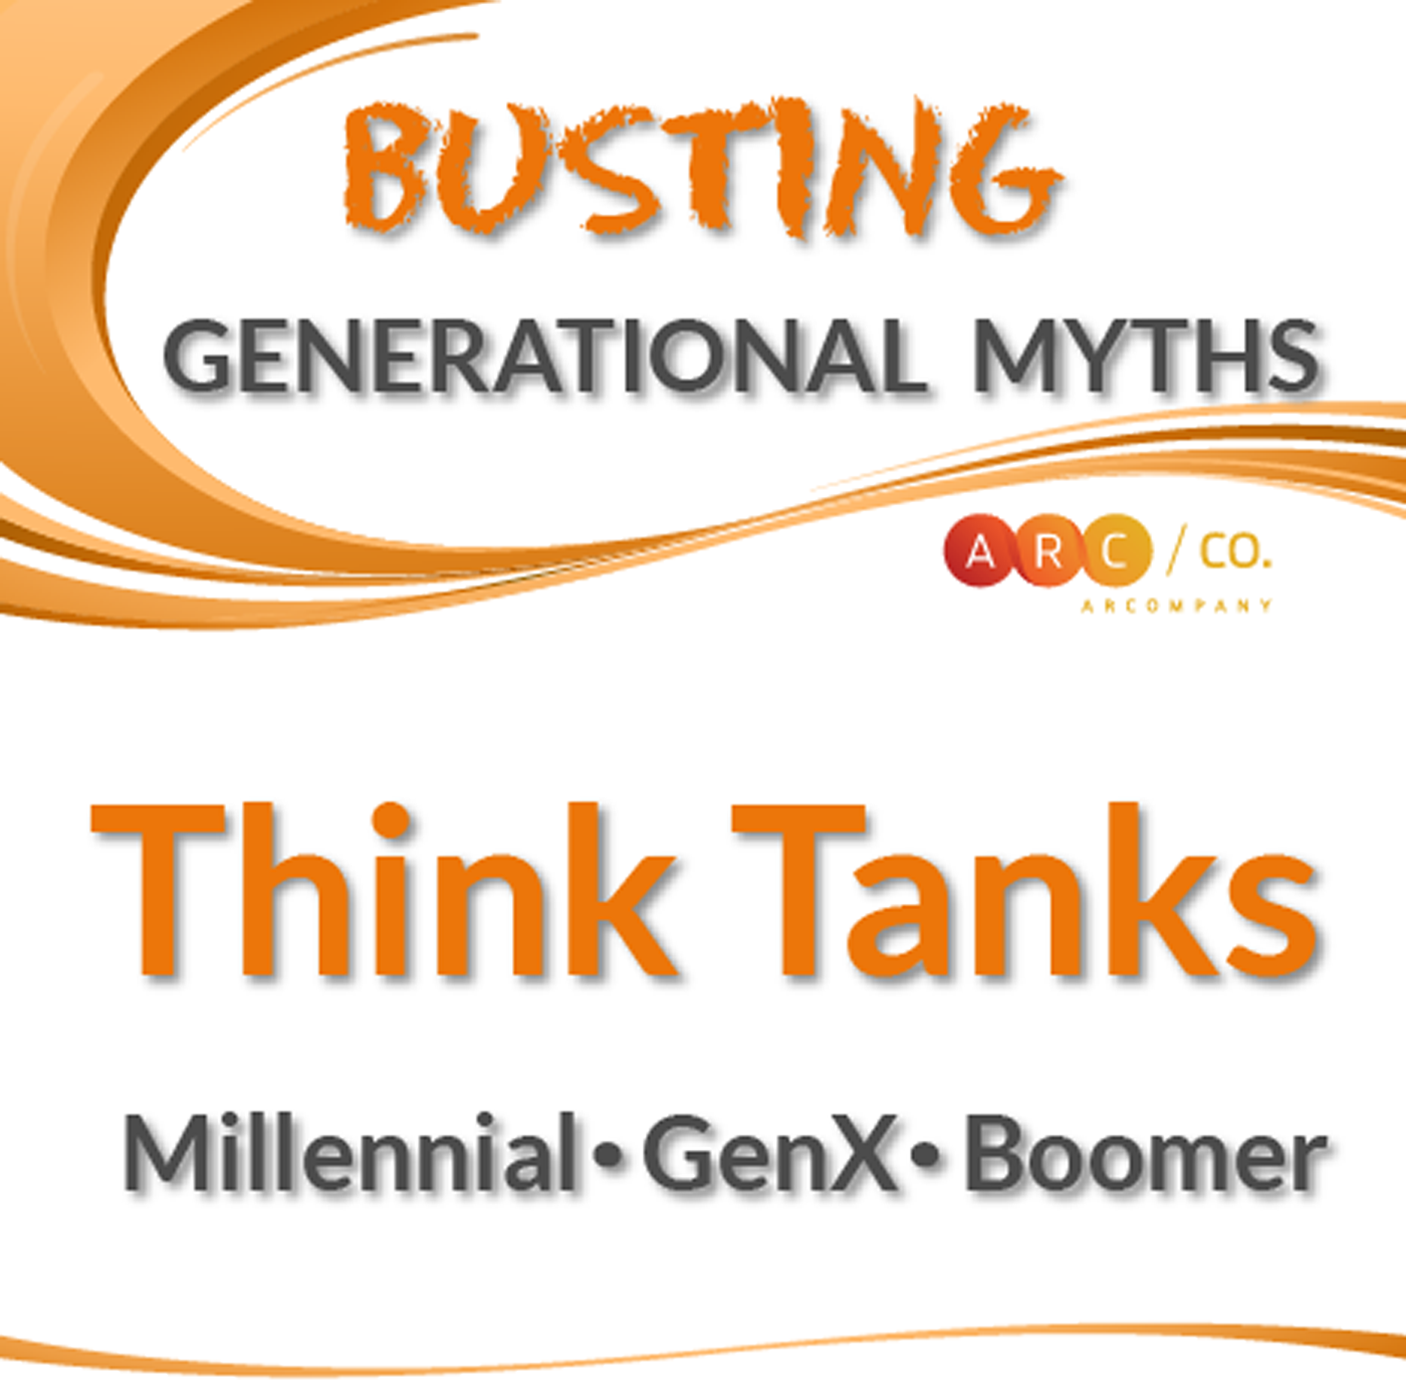 busting generational myths